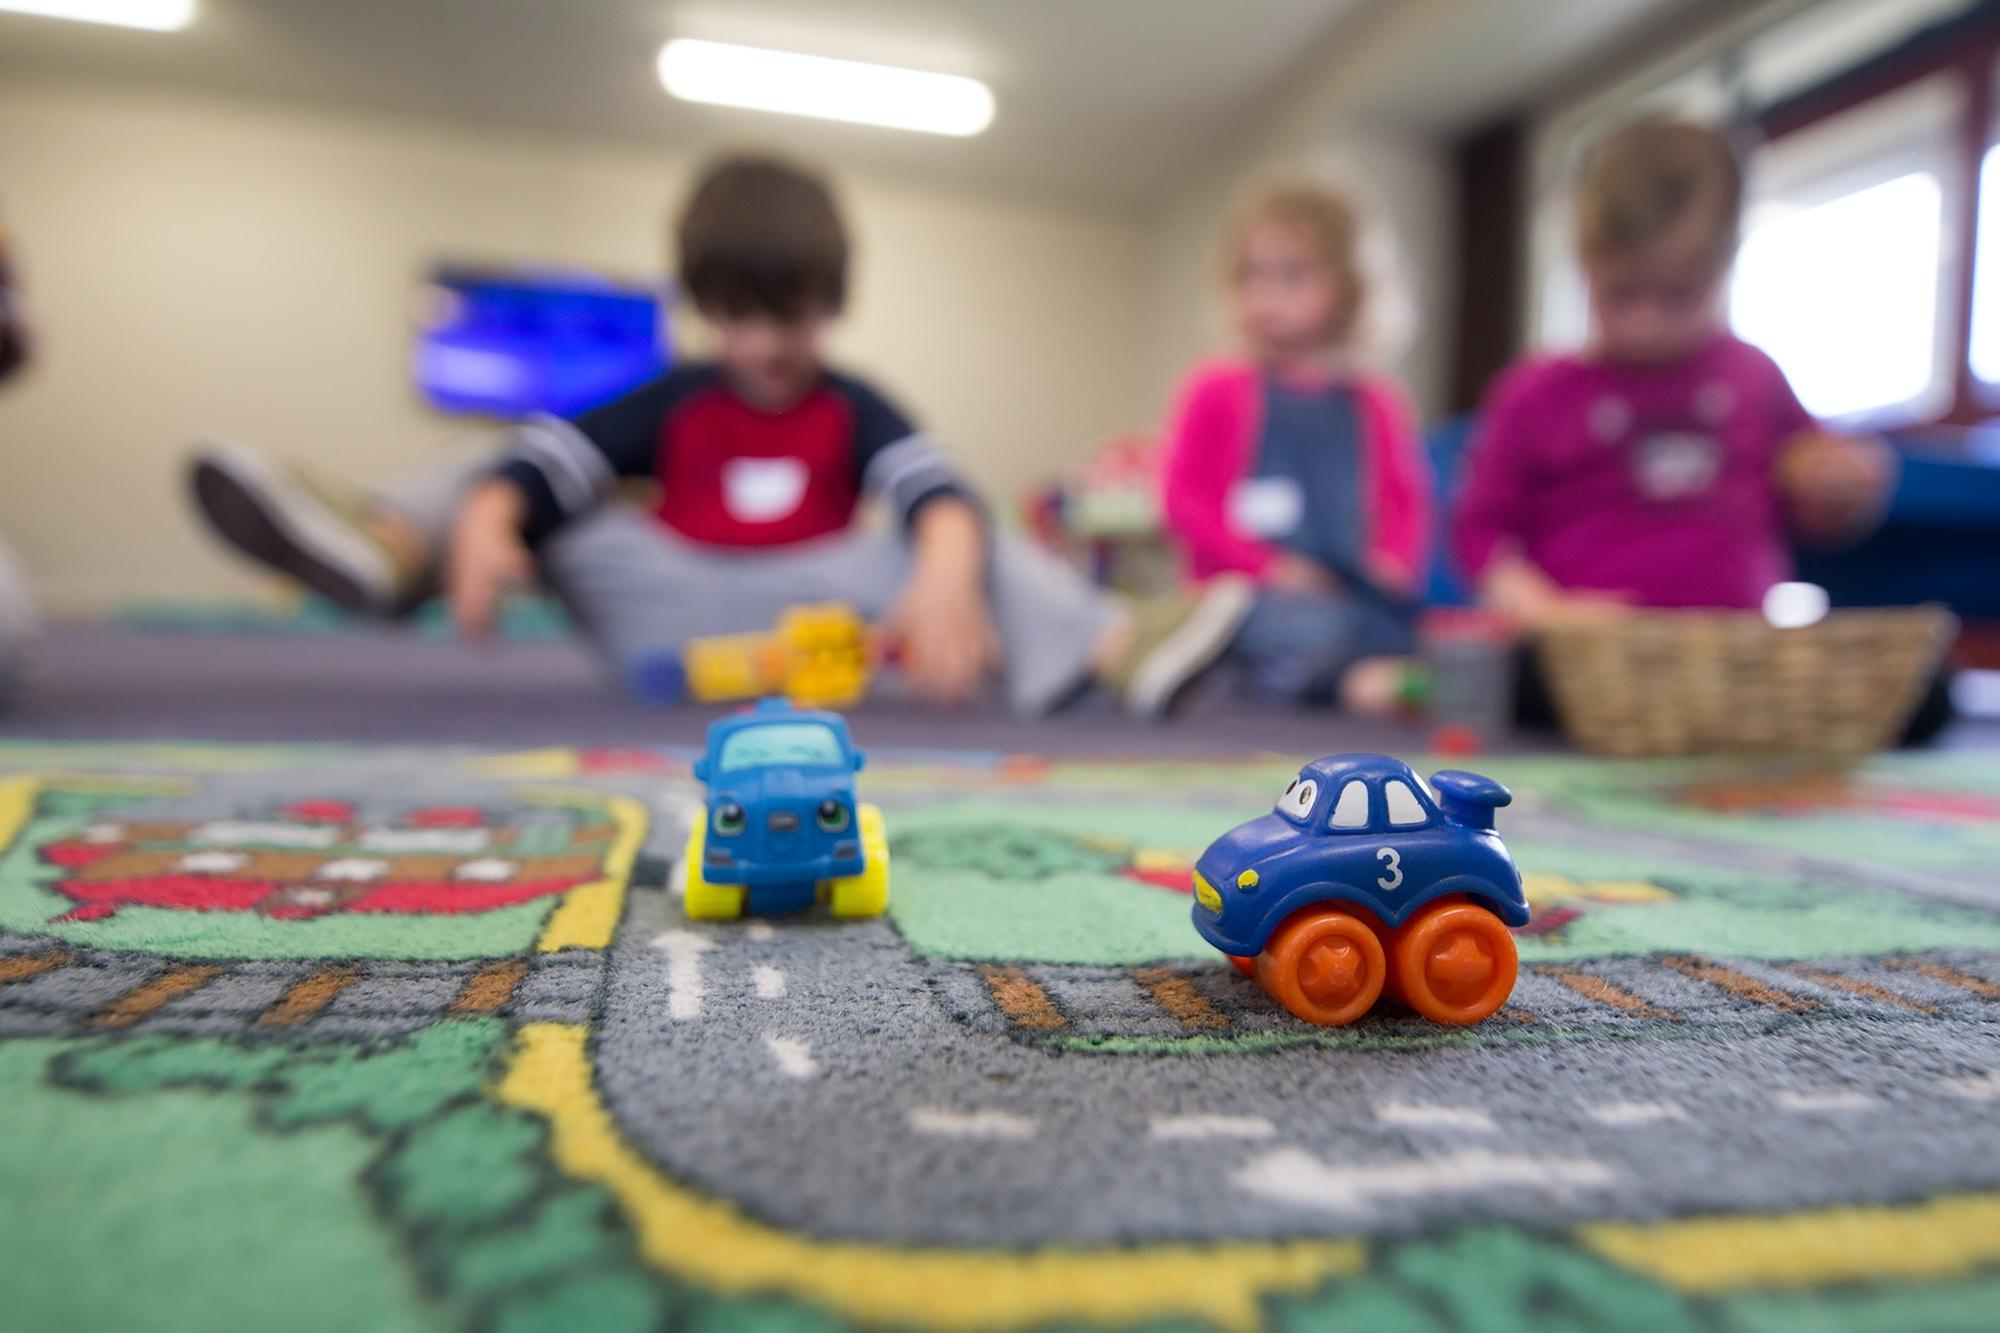 bethbap kids cars toys road carpet